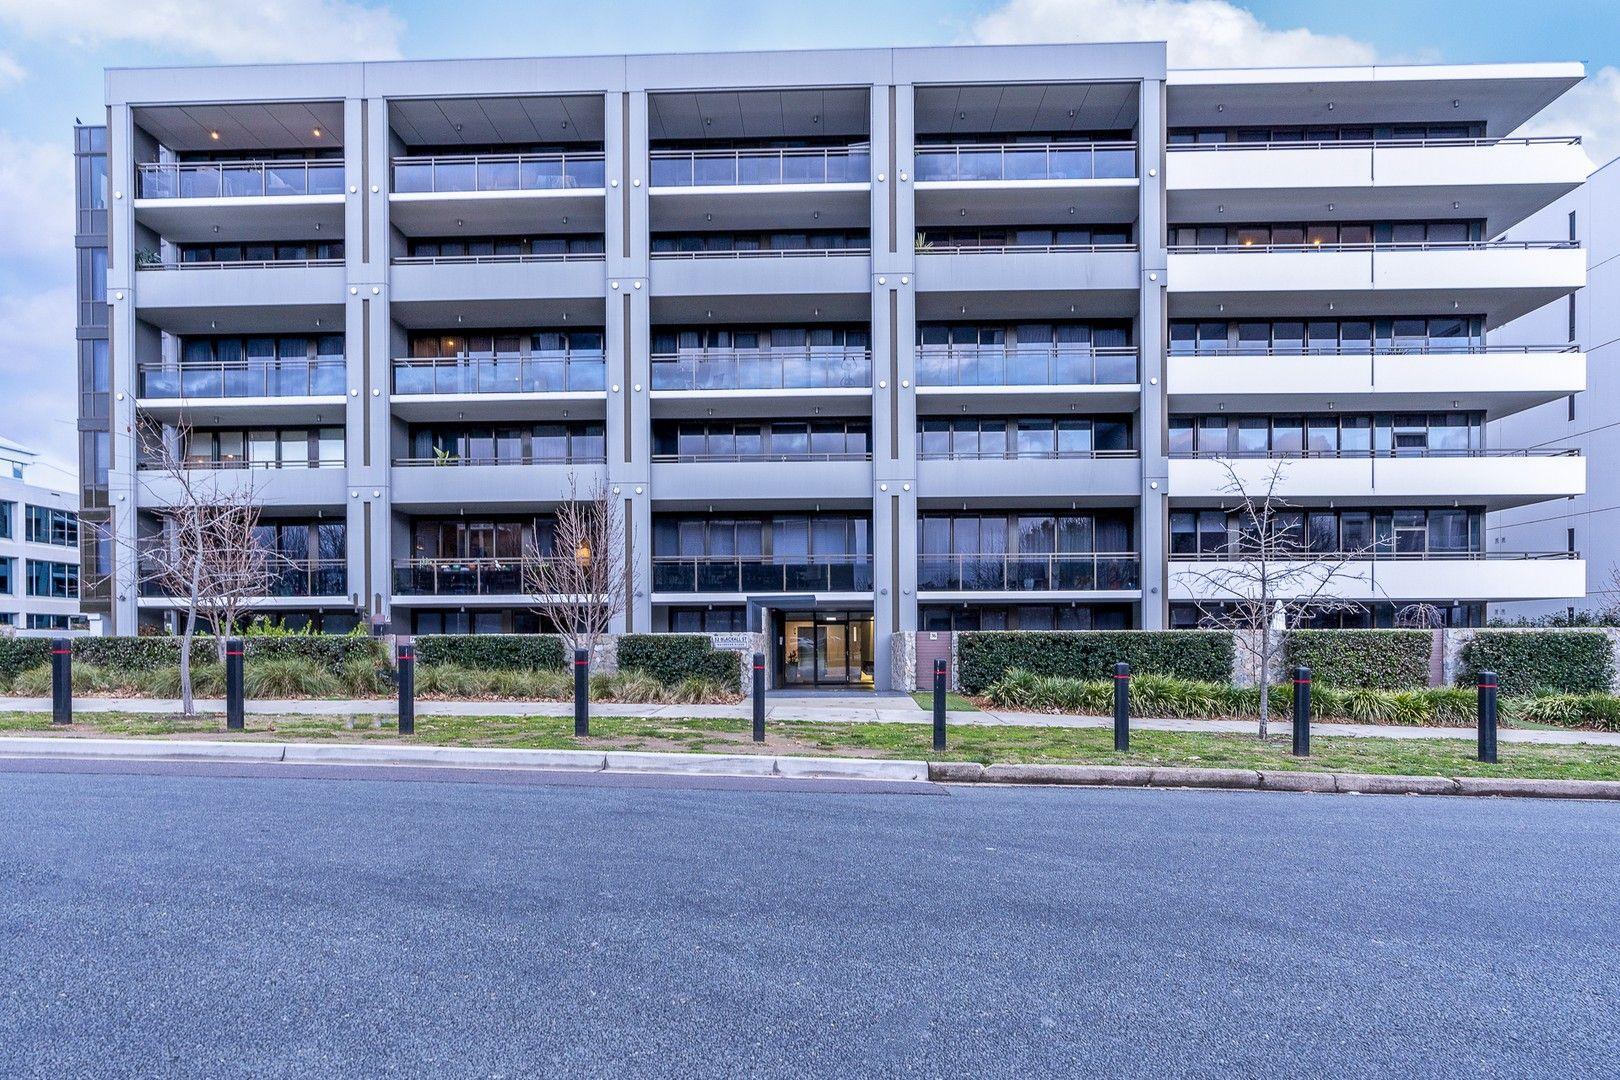 2 bedrooms Apartment / Unit / Flat in 133/32 Blackall Street BARTON ACT, 2600